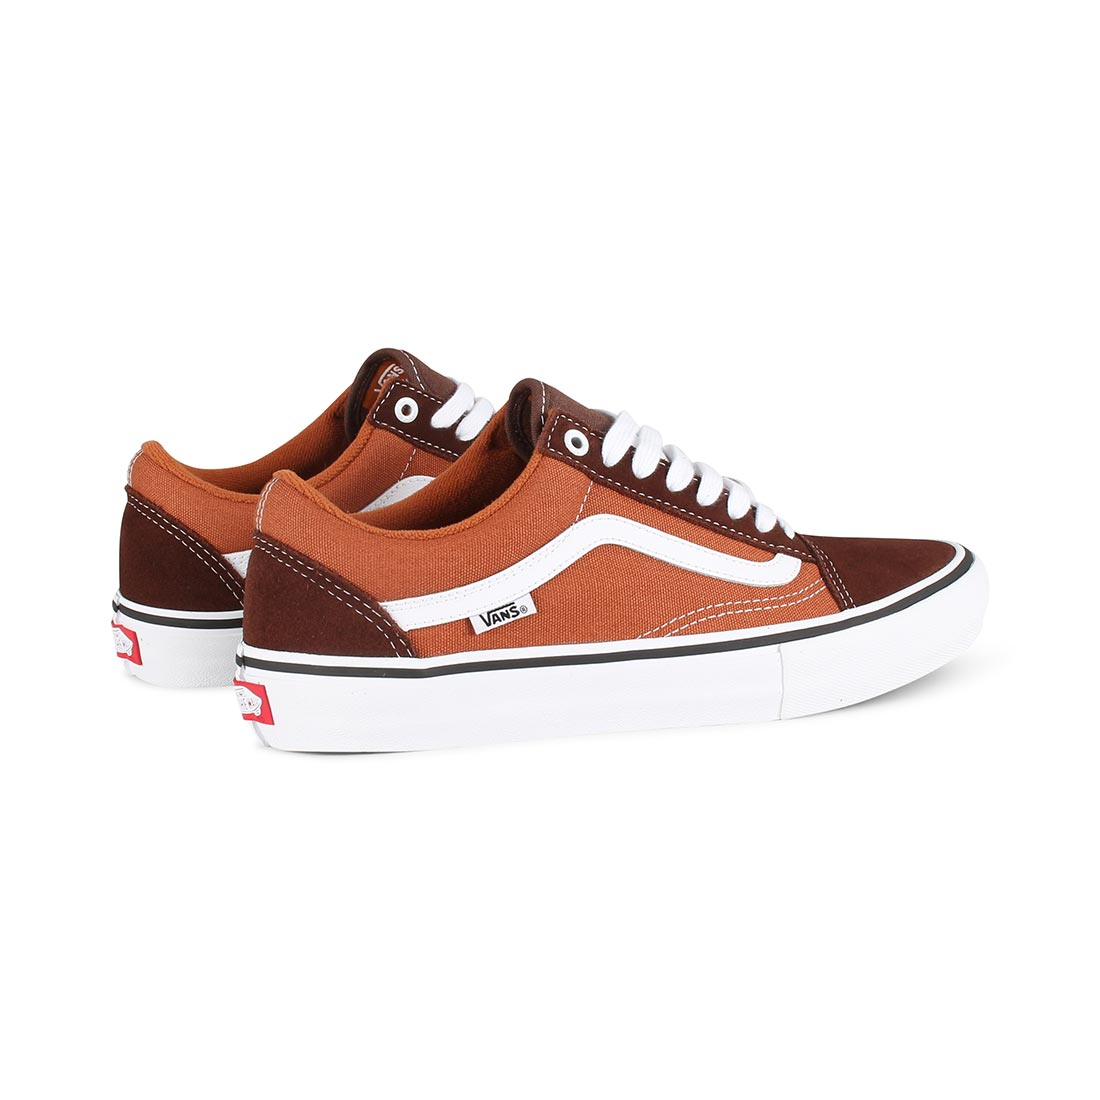 e847621473bb Vans Old Skool Pro Skate Shoes - Potting Soil   Brown